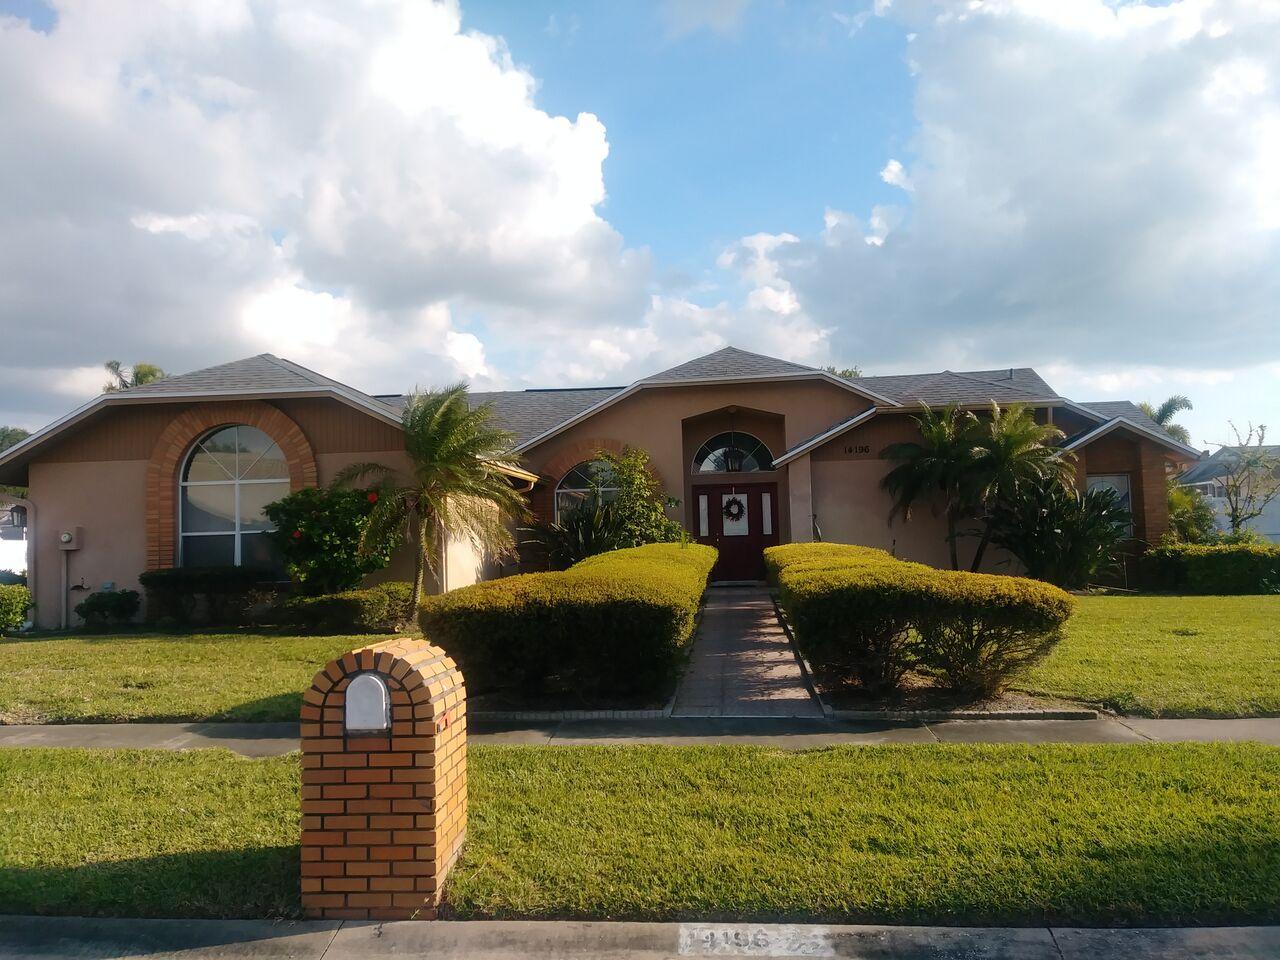 Photo of 14196 Joel Ct, Largo, FL, 33774